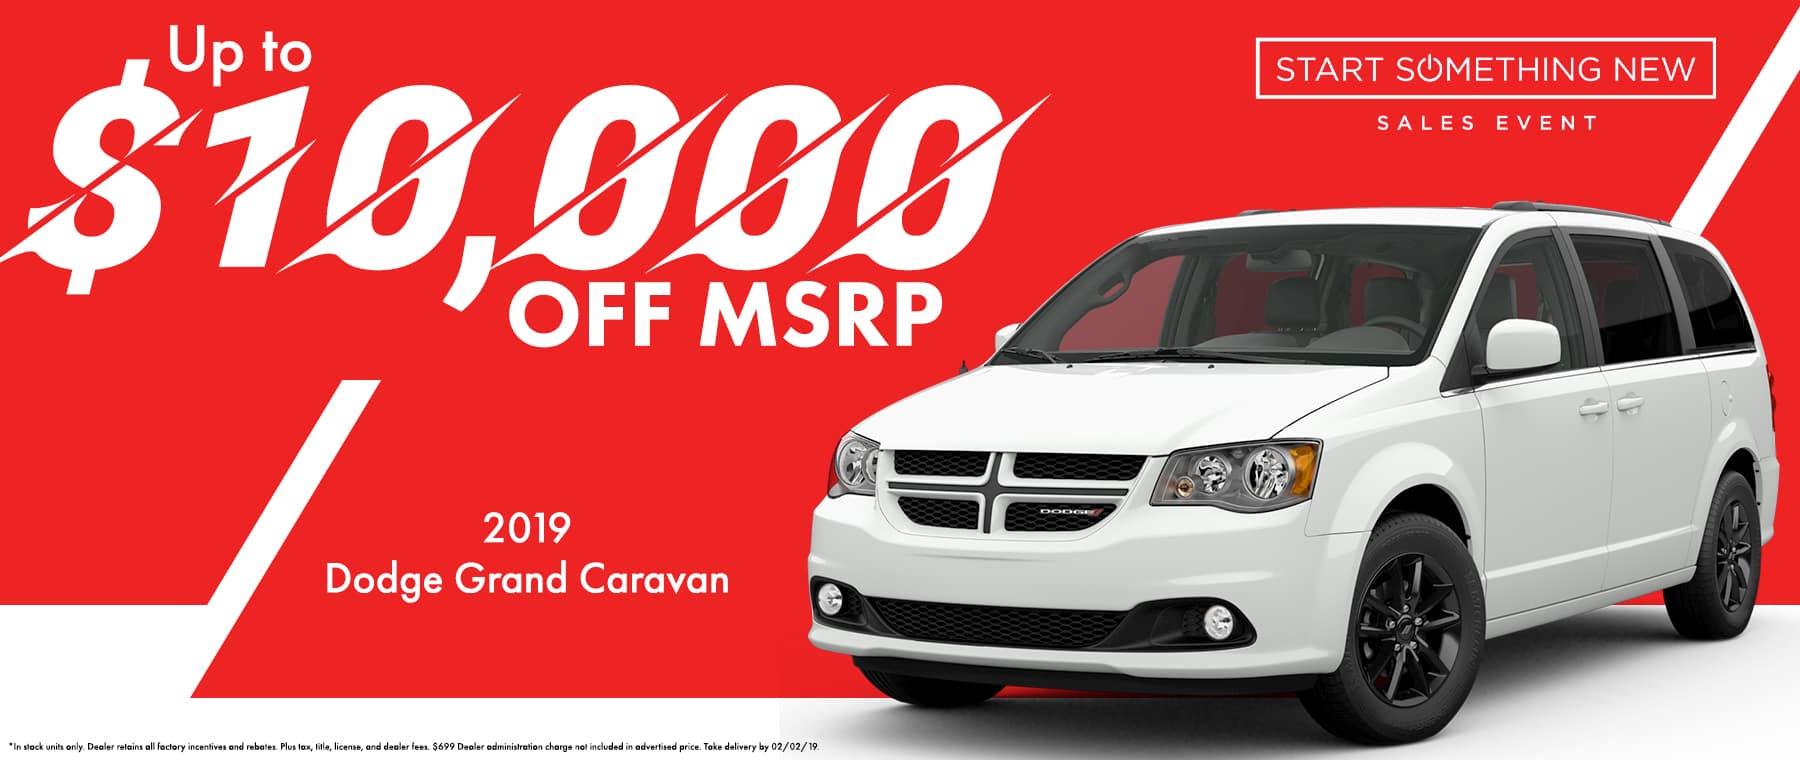 2019 Dodge Grand Caravan Deal